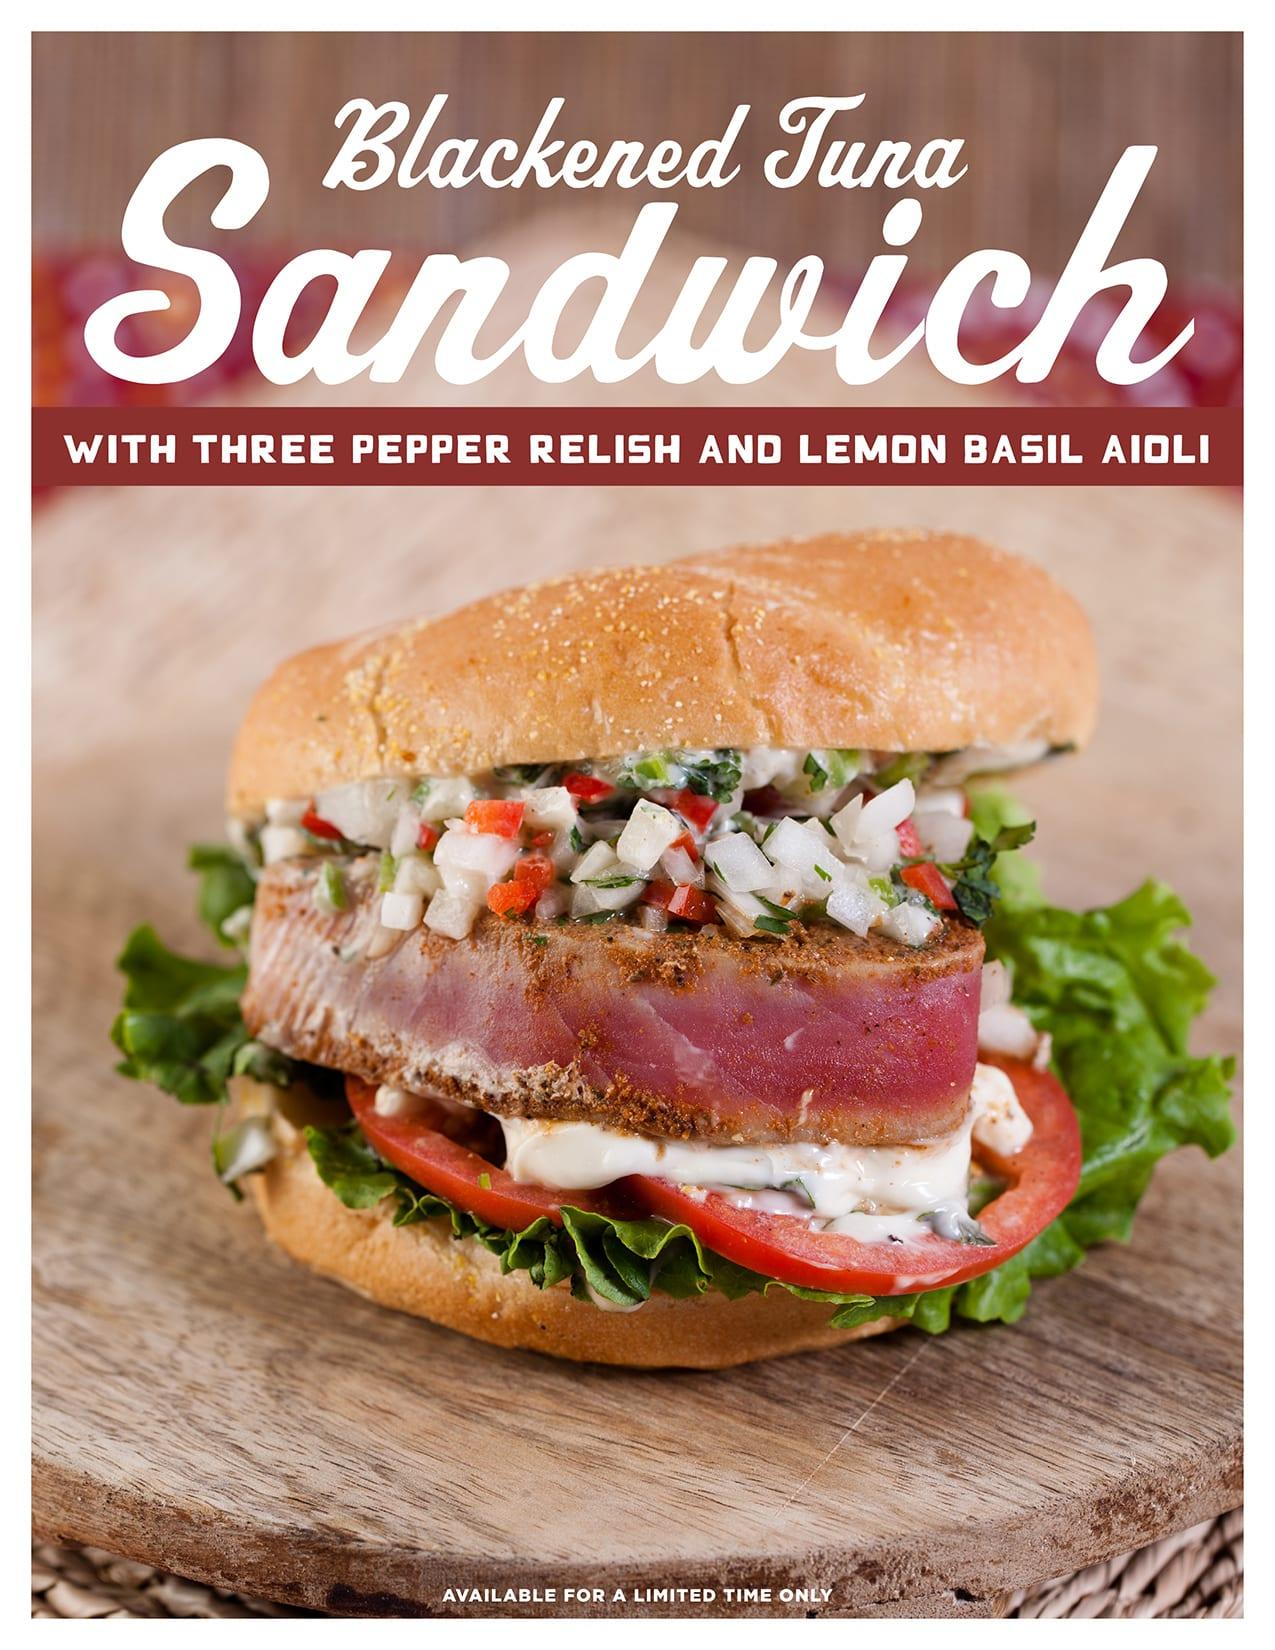 1604_april-LTOs_blackened-tuna-sandwich_8.5x11_static